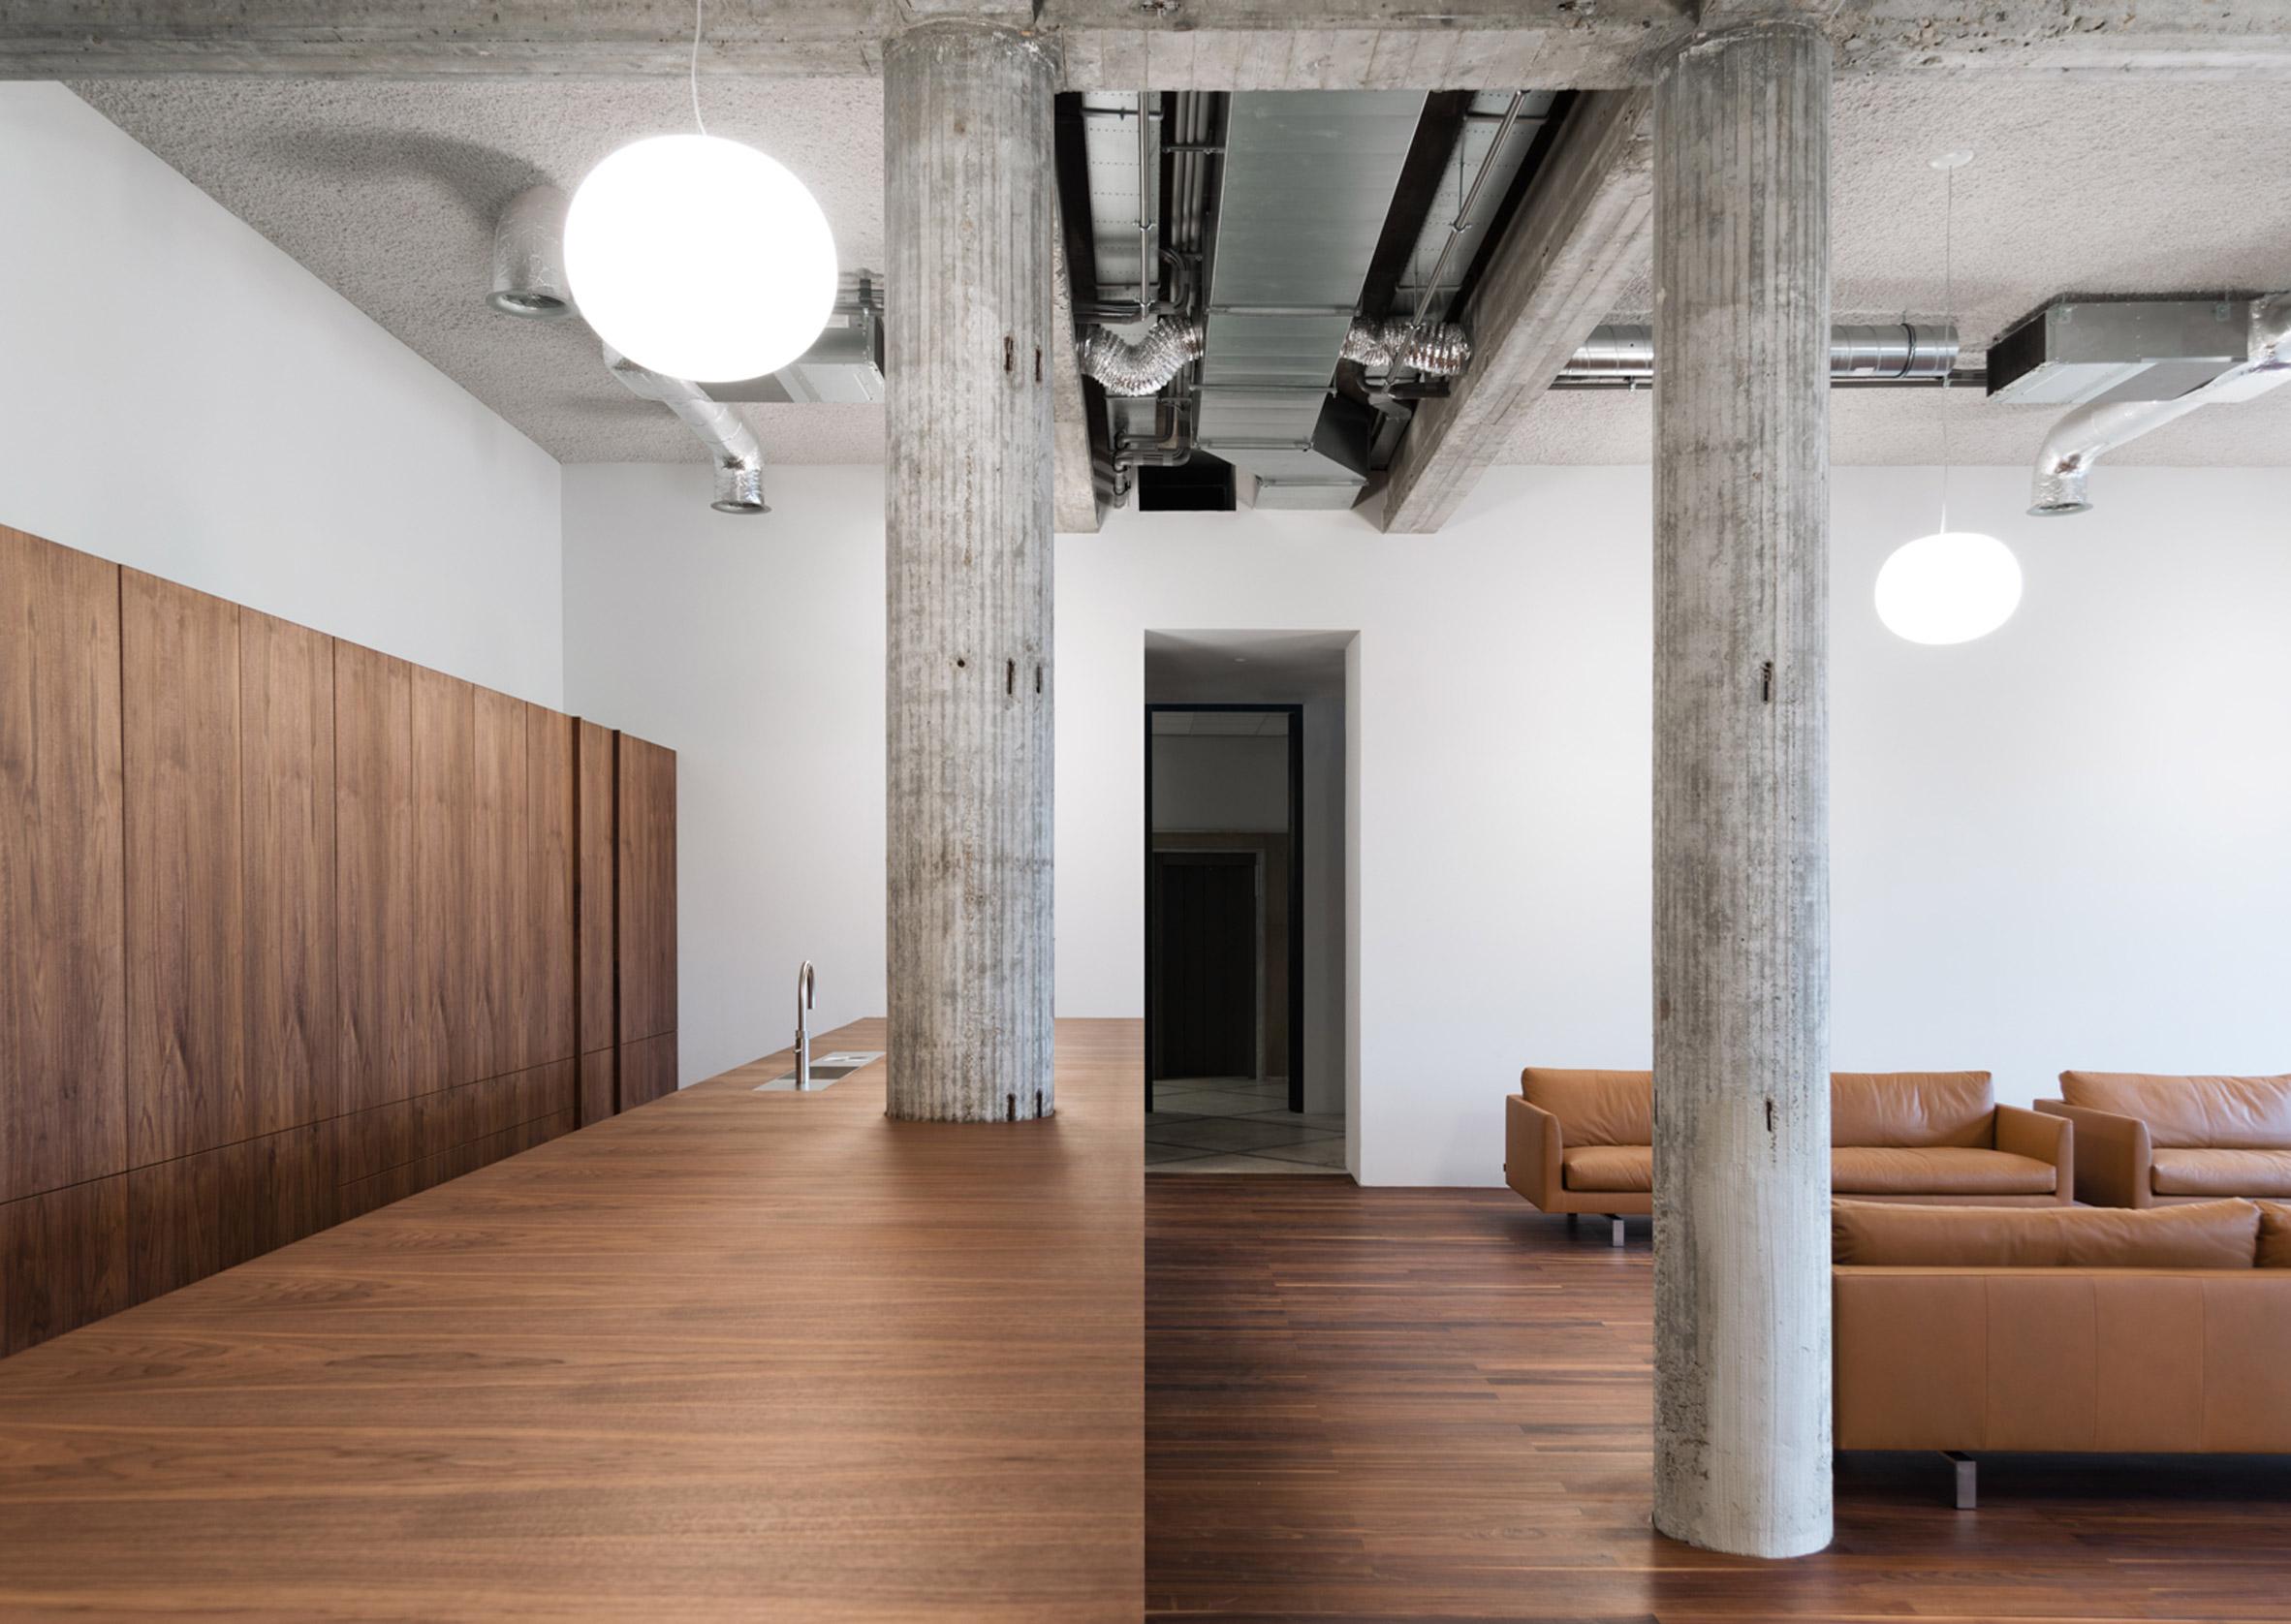 KAAN Architecten transforms Rotterdam bank into riverside studio